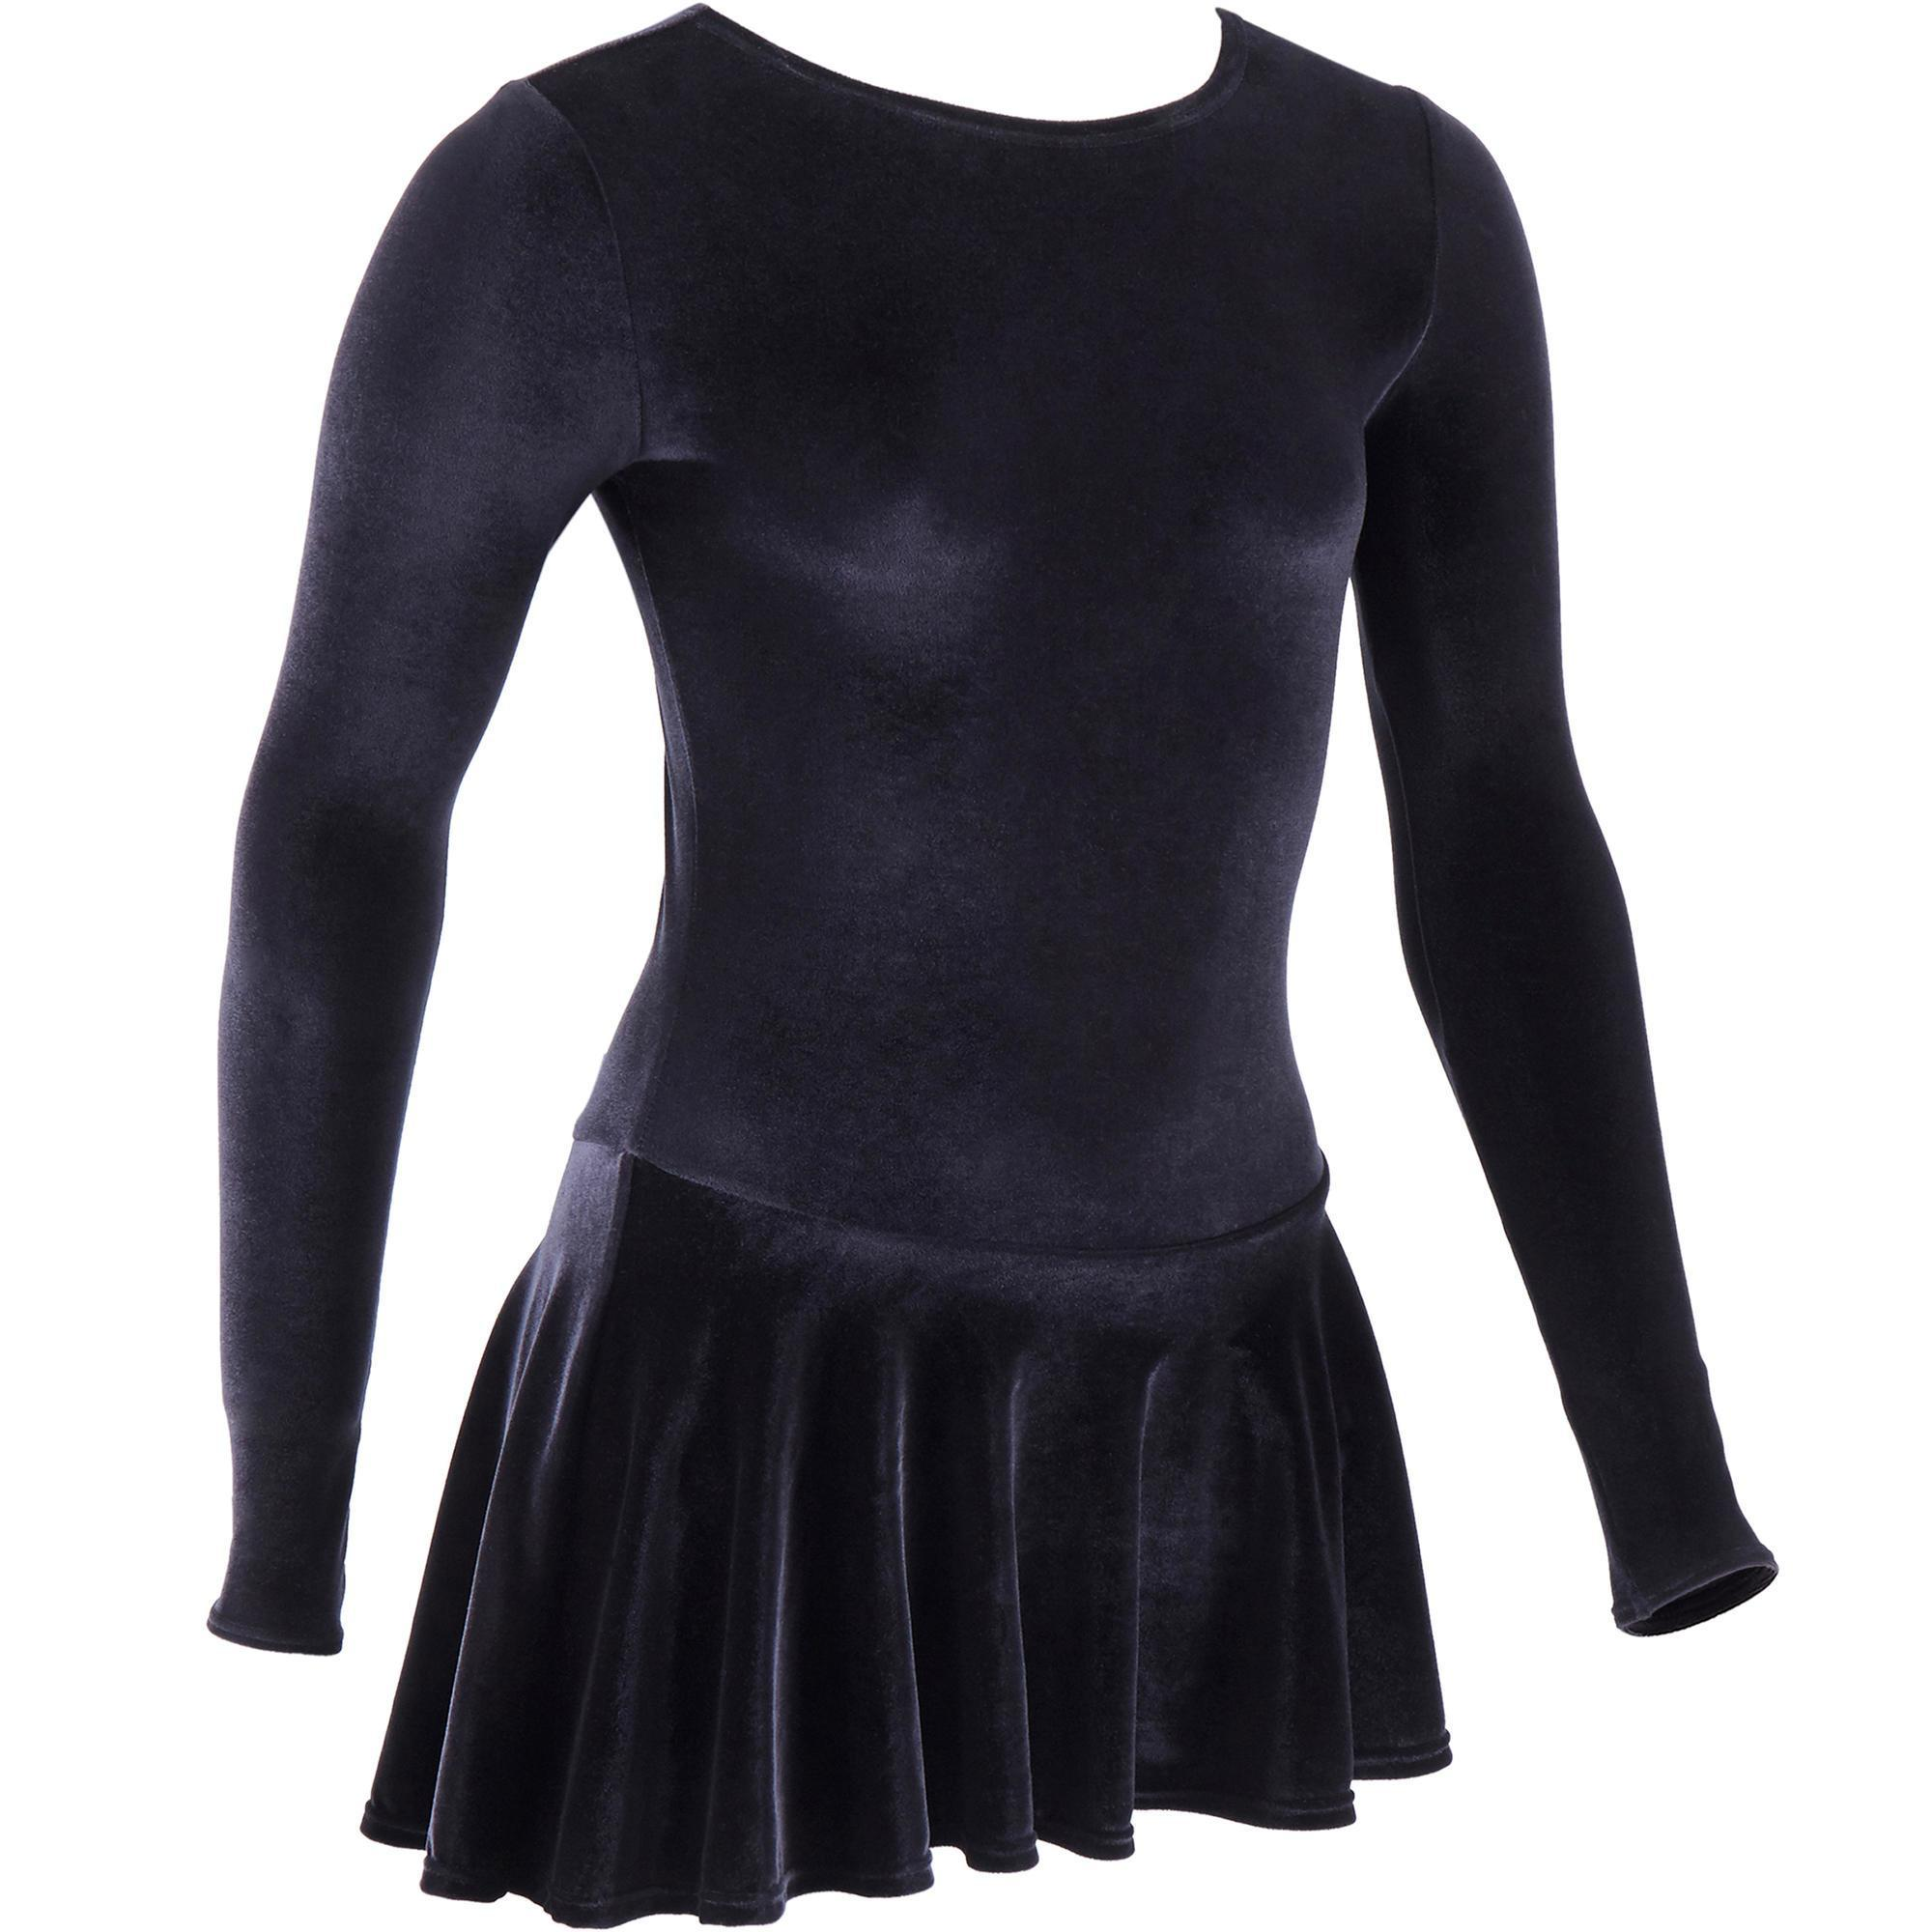 Kinder Tunika Trainingskleid Eiskunstlauf Kinder schwarz | 03583788058410